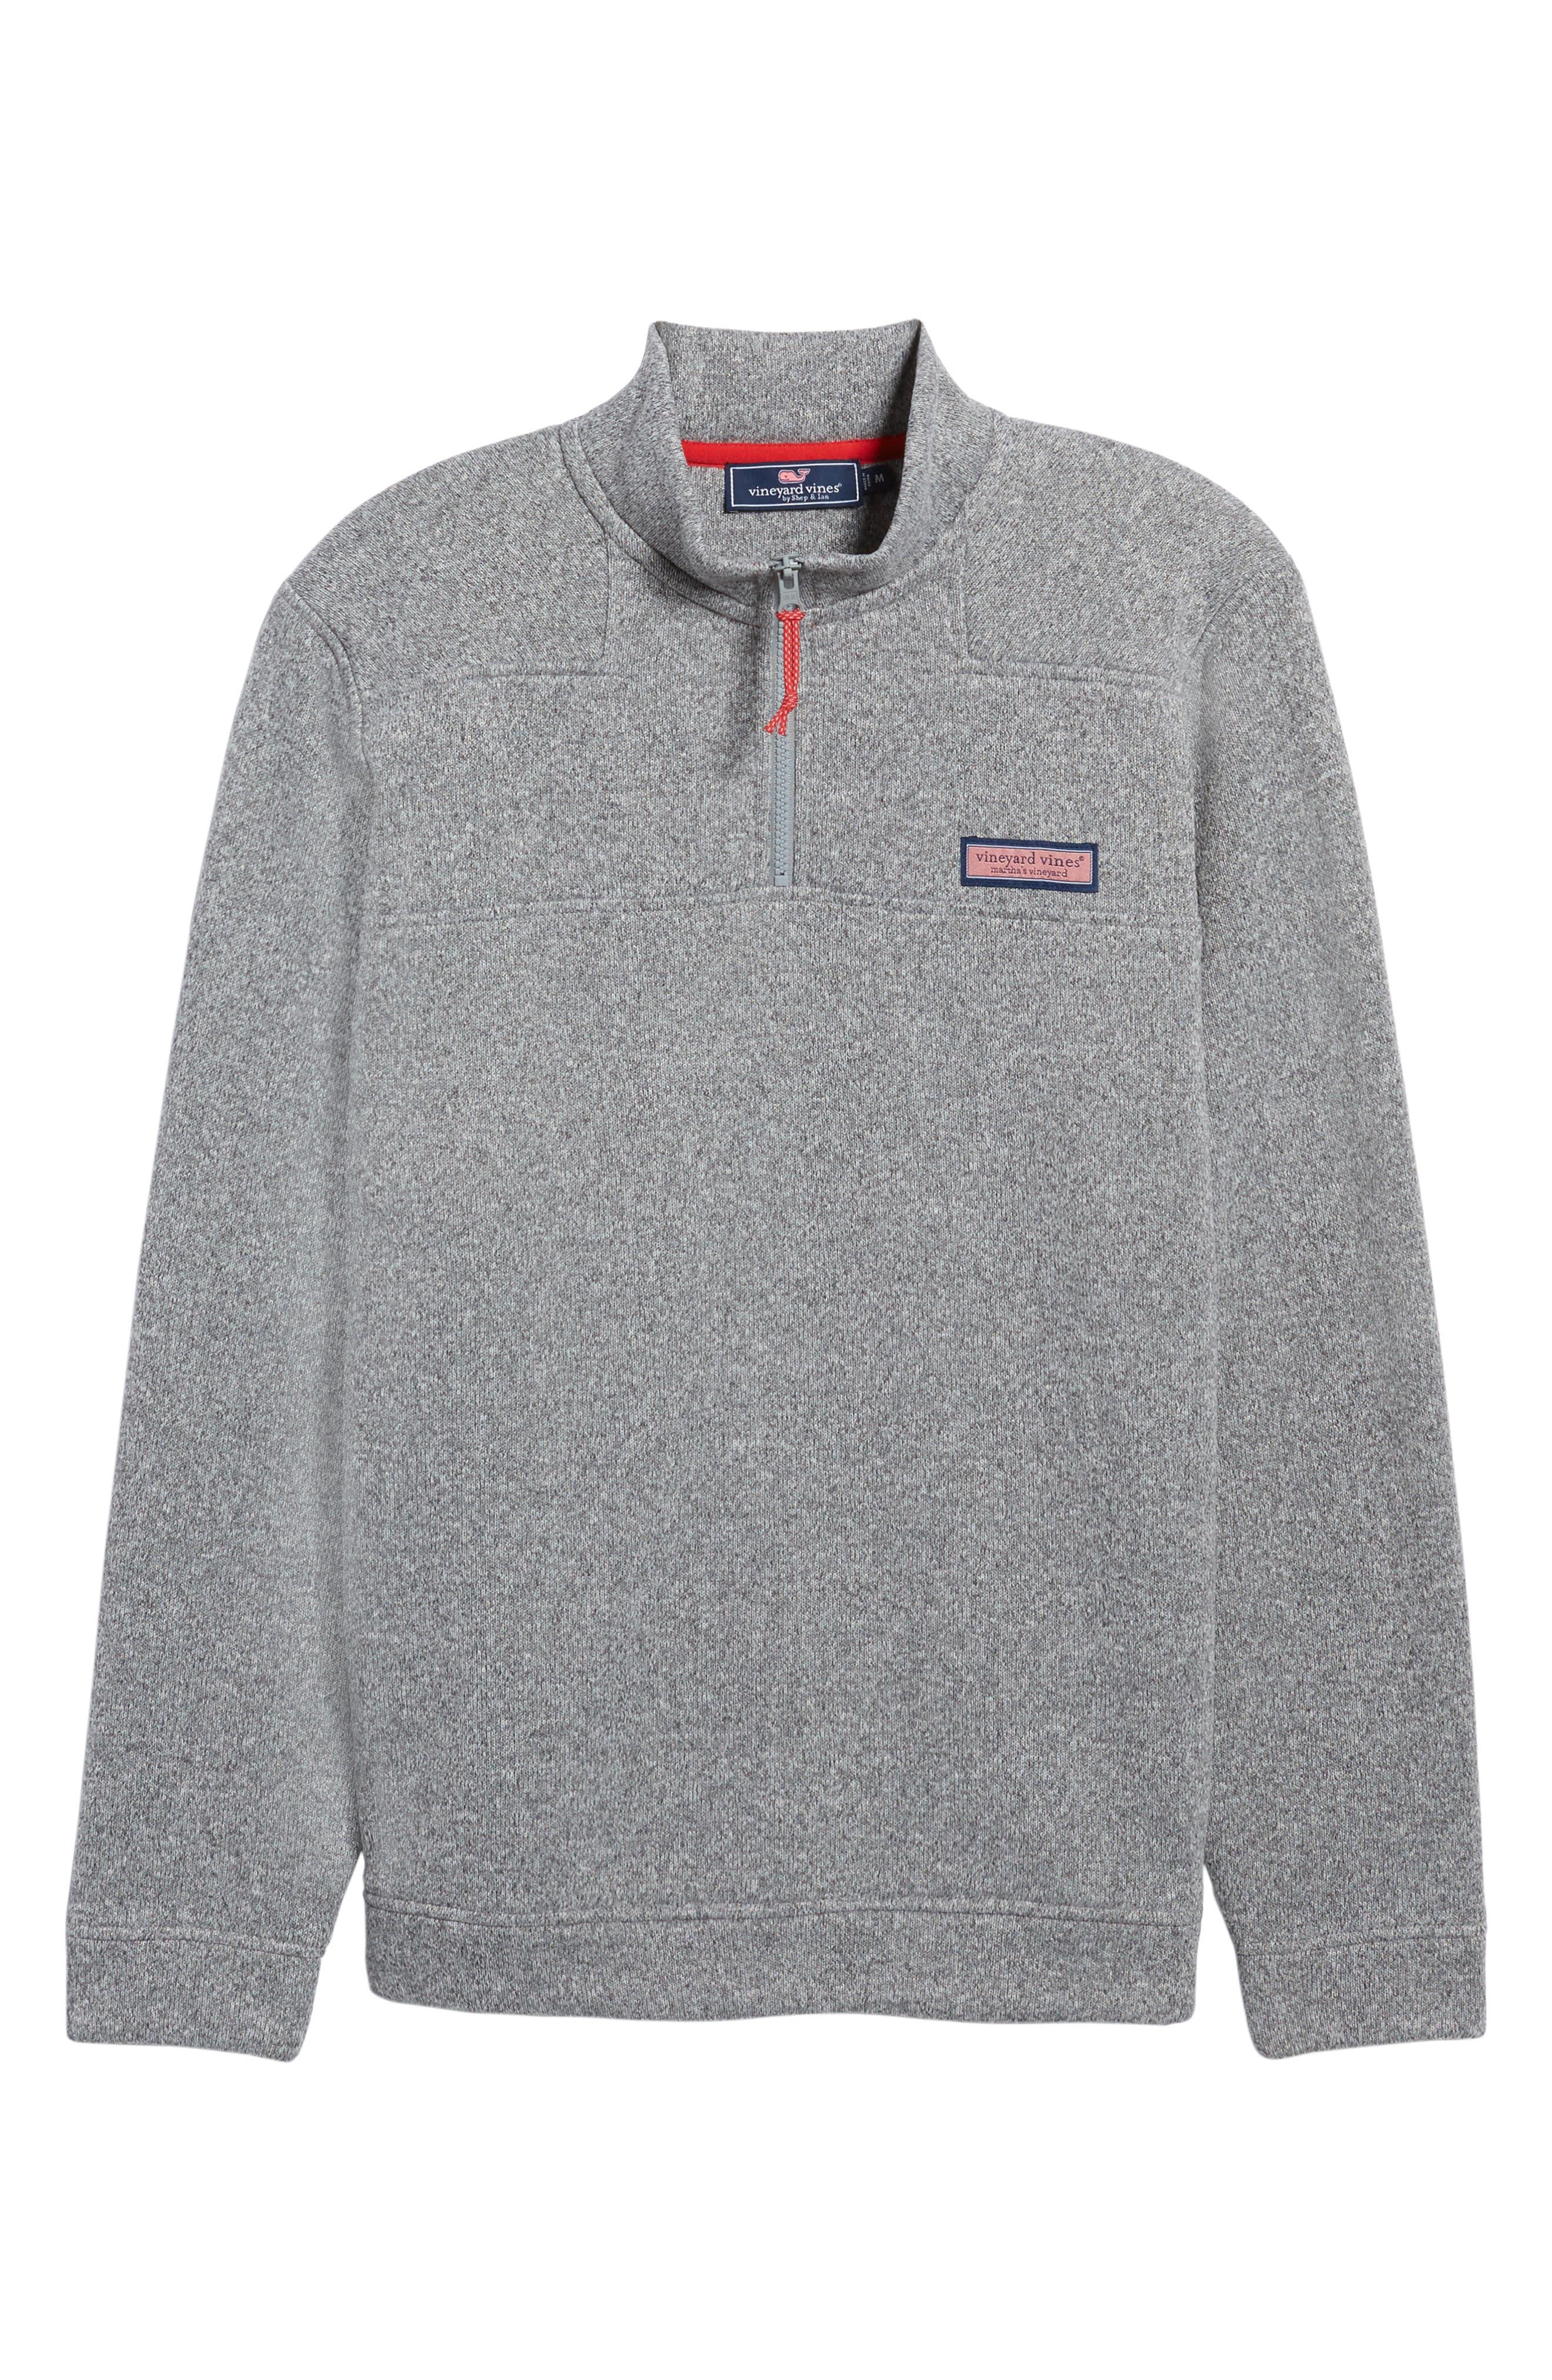 Shep Sweater Fleece Quarter Zip Pullover,                             Alternate thumbnail 11, color,